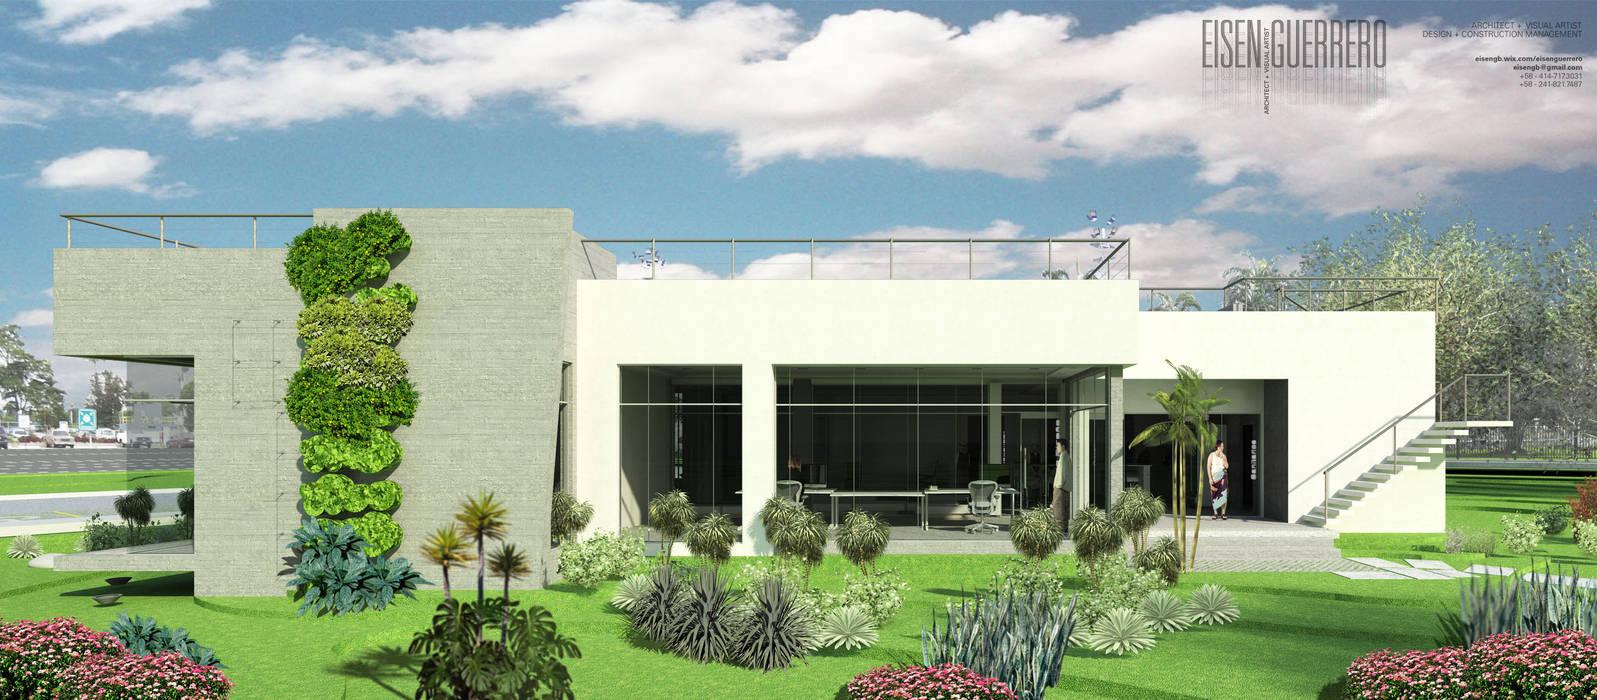 Vista Lateral Sur. Oficina Experience Center. 2015: Jardines de estilo  por Eisen Arquitecto